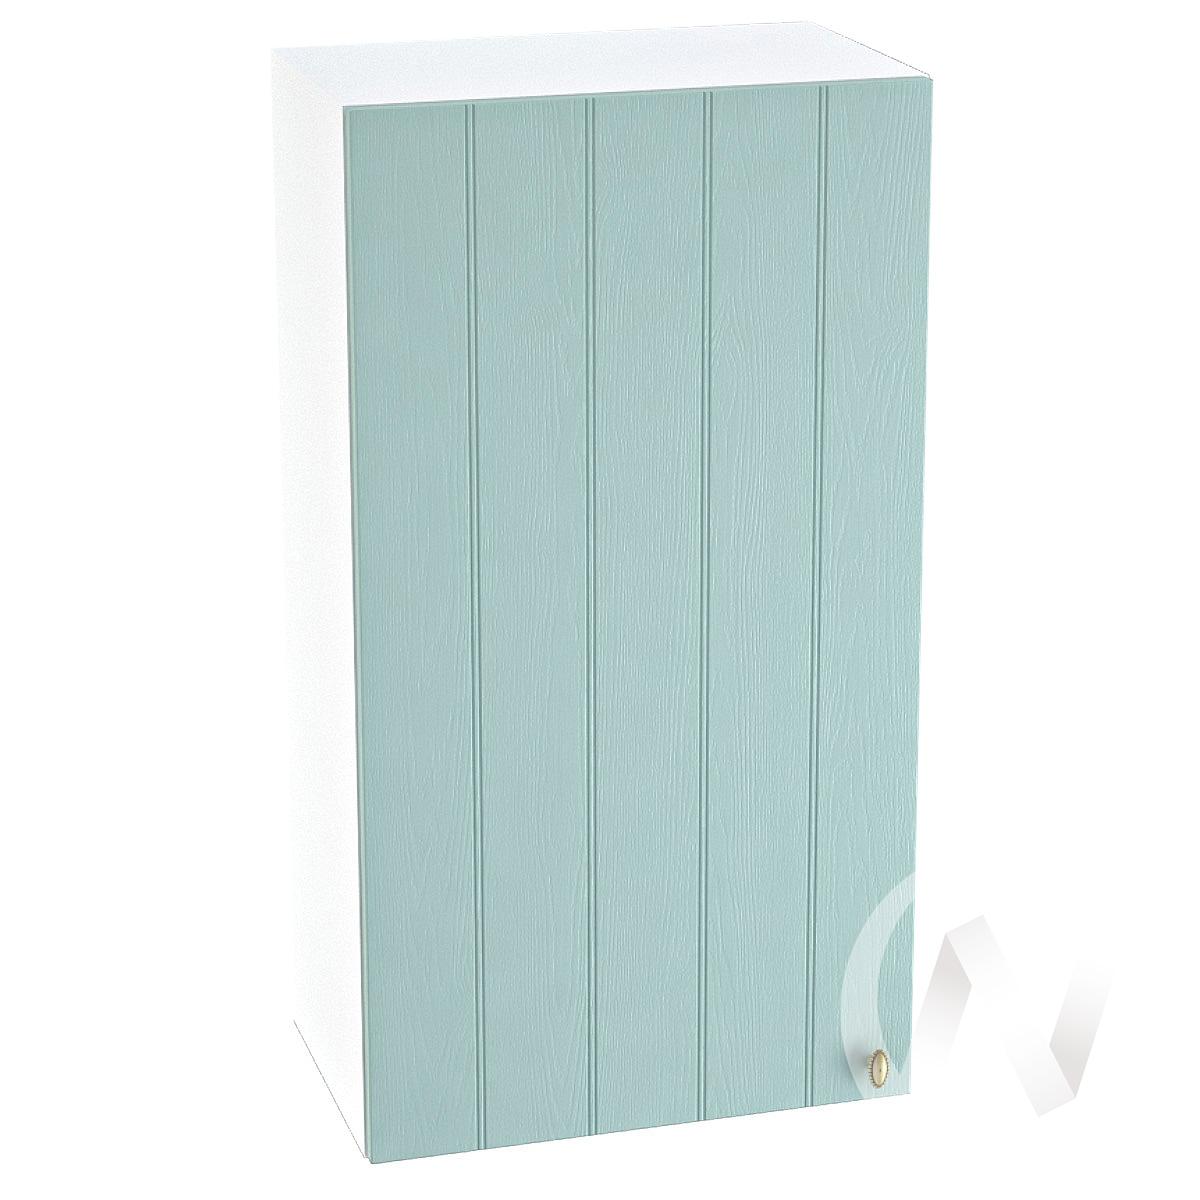 "Кухня ""Прованс"": Шкаф верхний 509, ШВ 509 (голубой/корпус белый)"